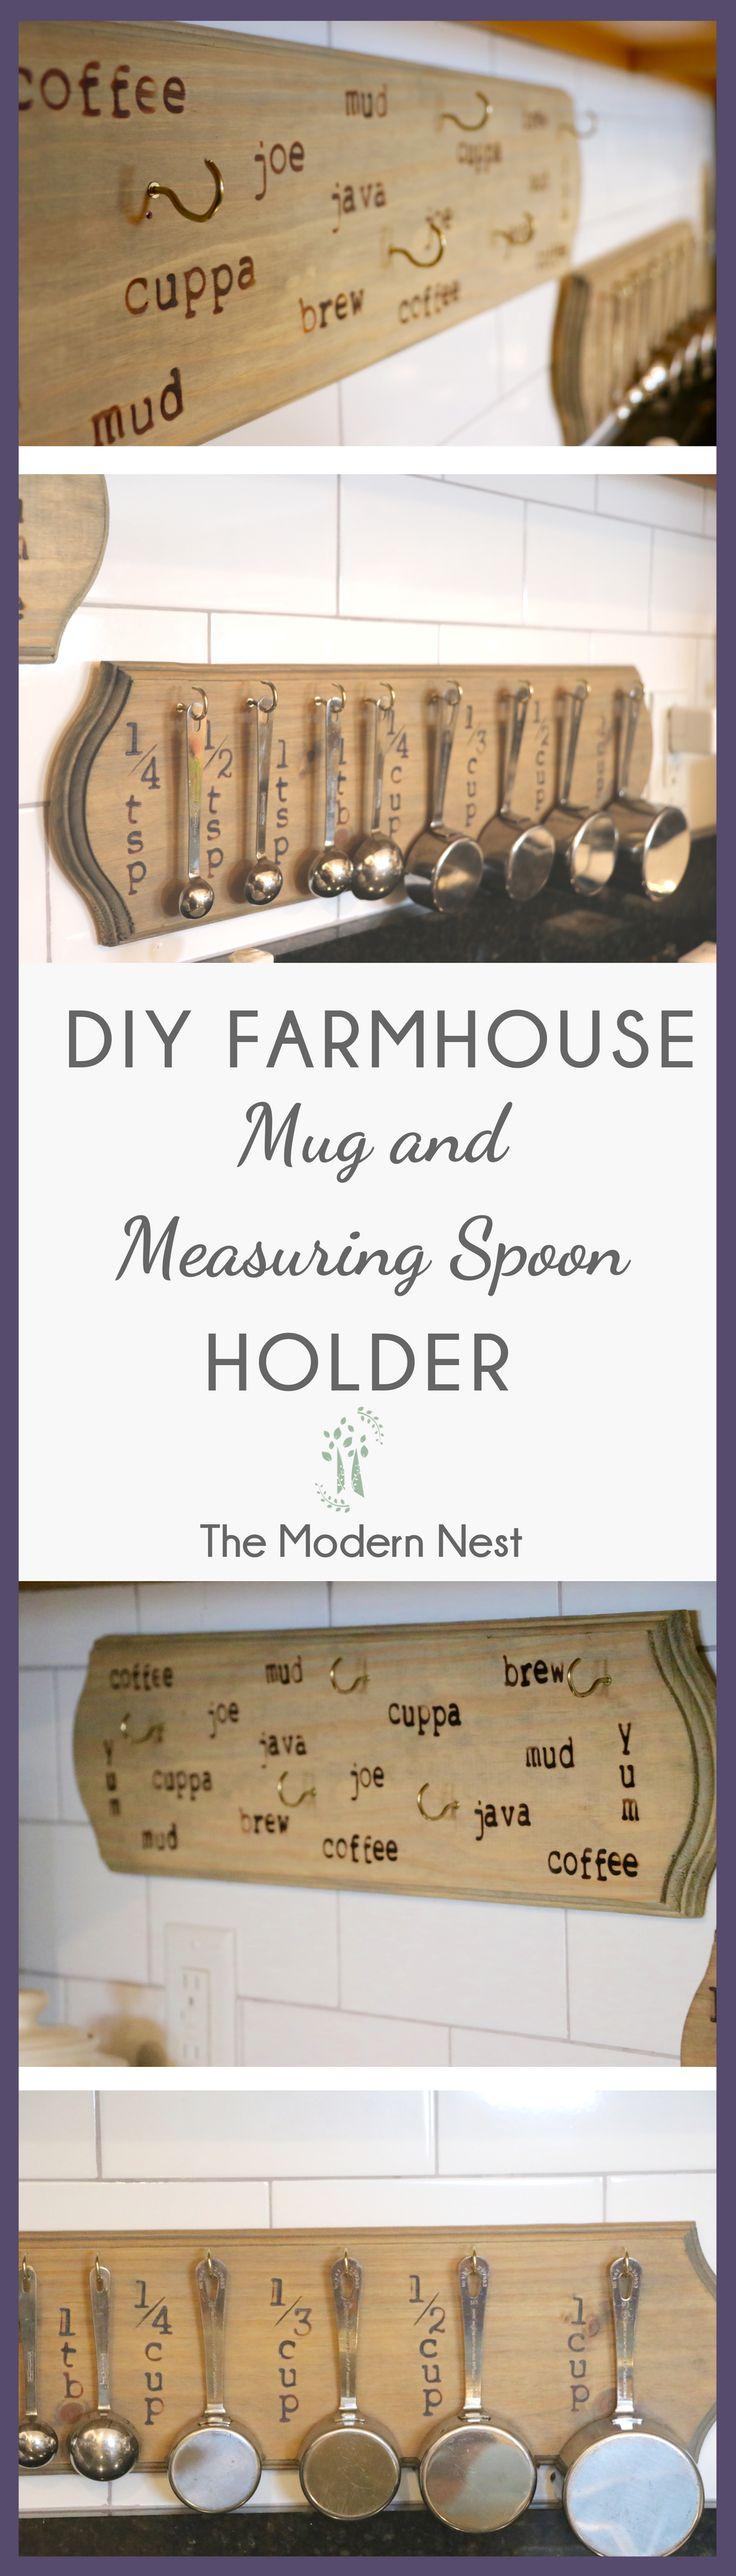 Fun and easy DIY farmhouse mug holder or measuring spoon holder! Check out https://www.themodernnestblog.com/?p=70 for the full DIY tutorial!